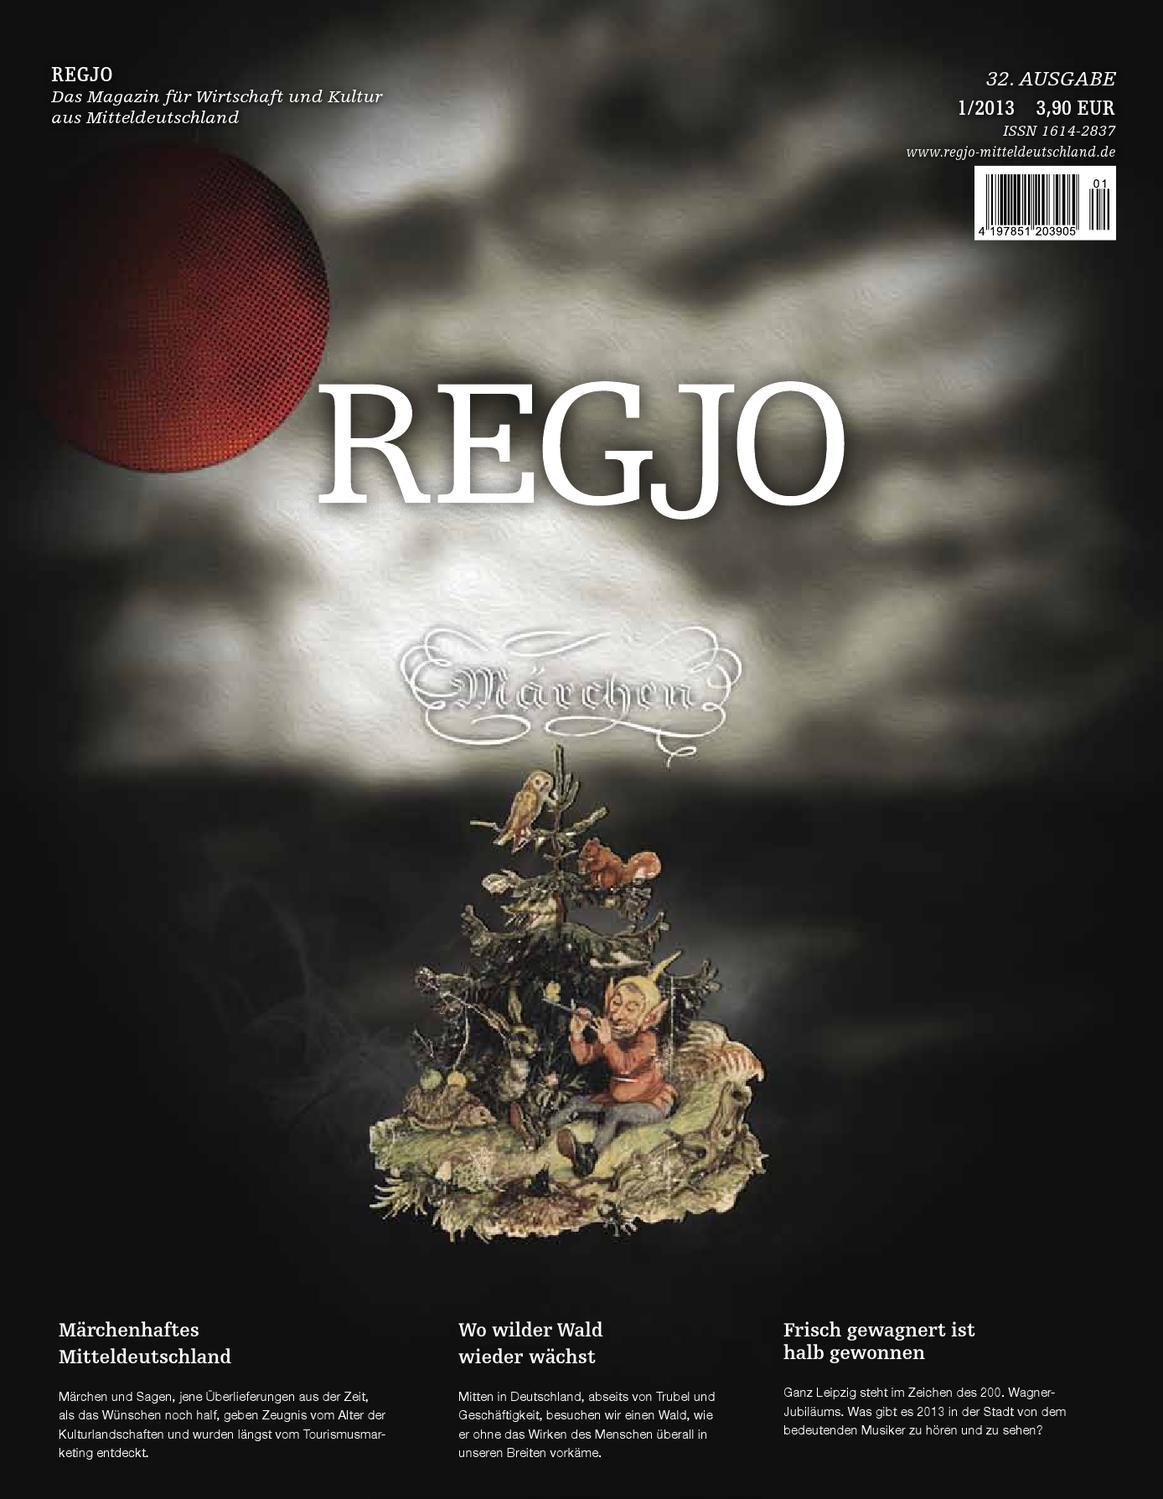 Regjo 01/2013 by regjo magazin verlag mitteldeutschland   issuu